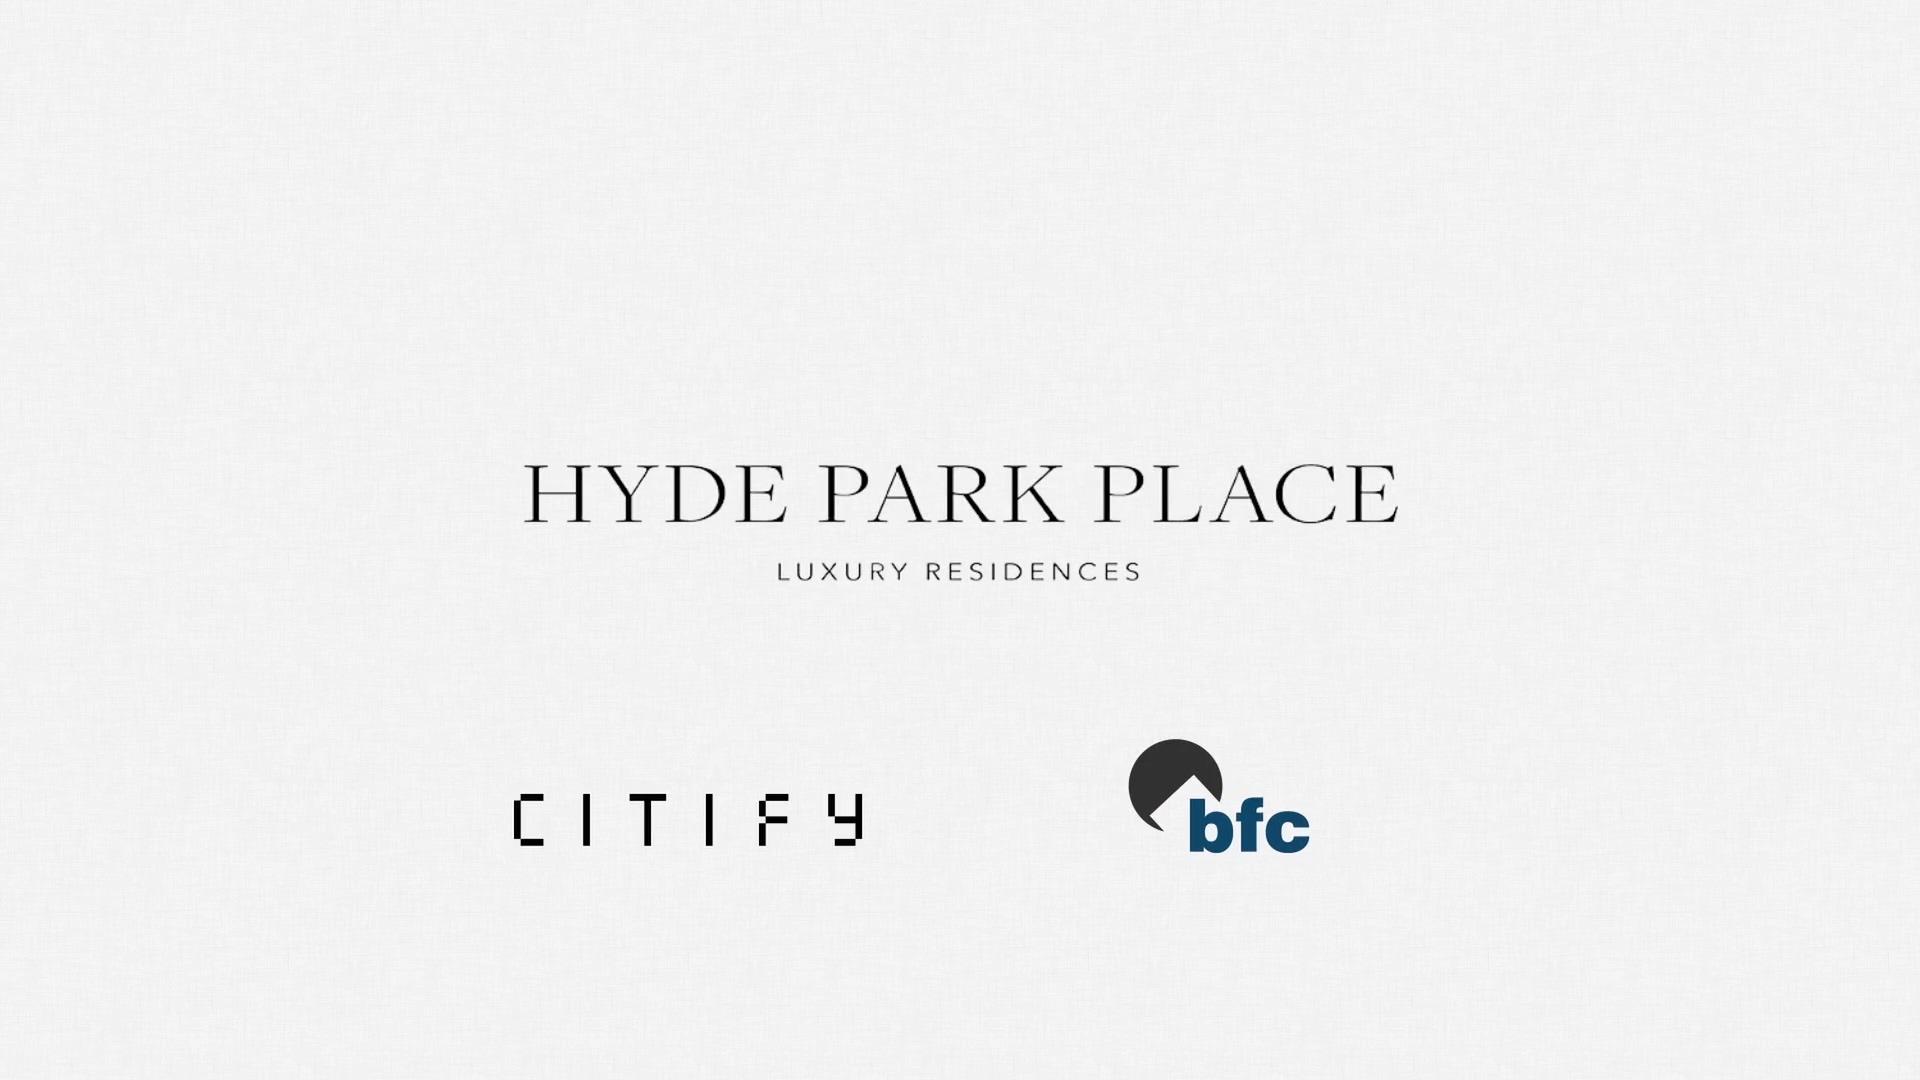 Citify - Hyde Park - April 2020